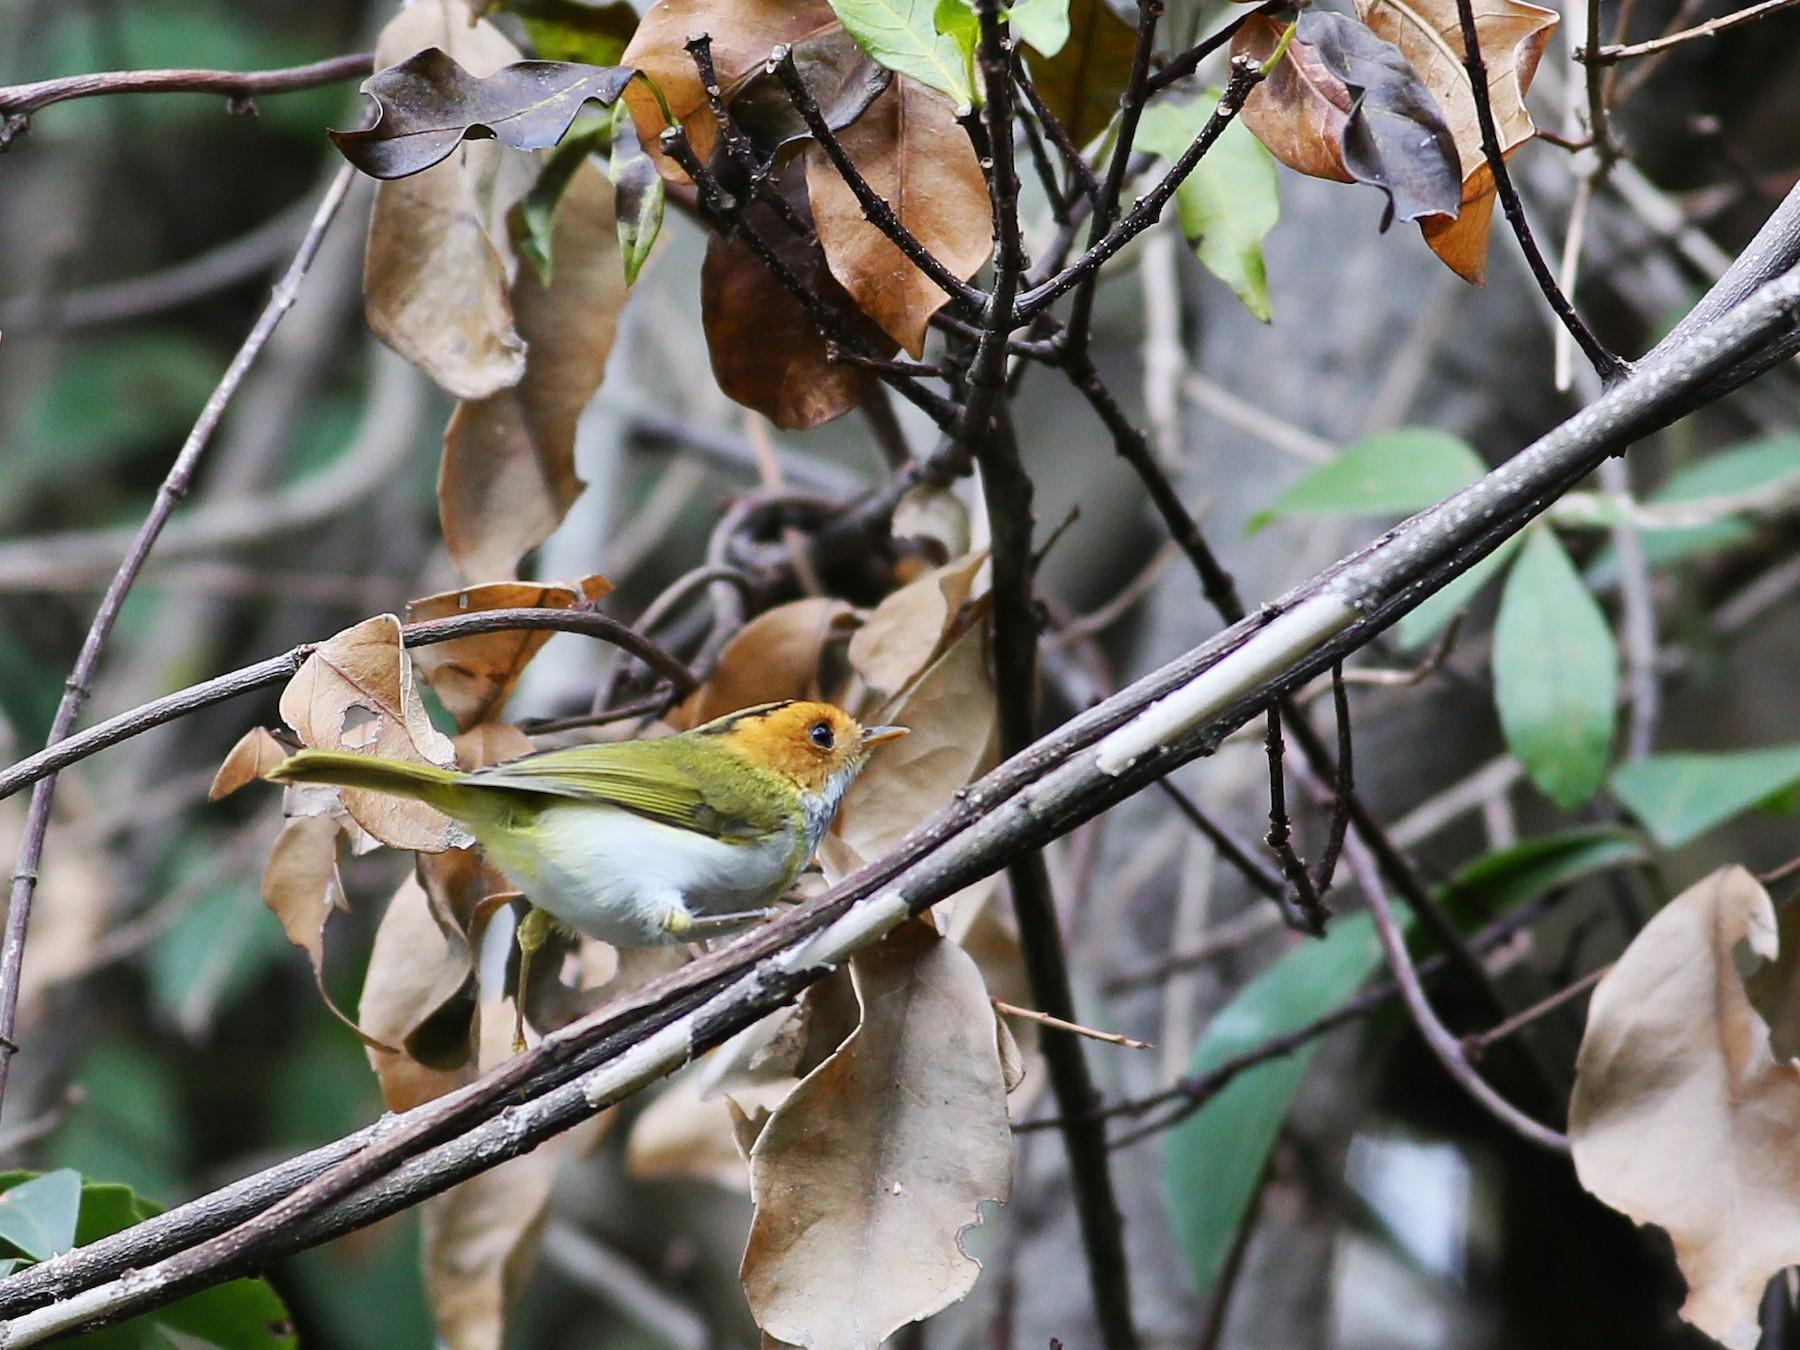 Rufous-faced Warbler - Ting-Wei (廷維) HUNG (洪)